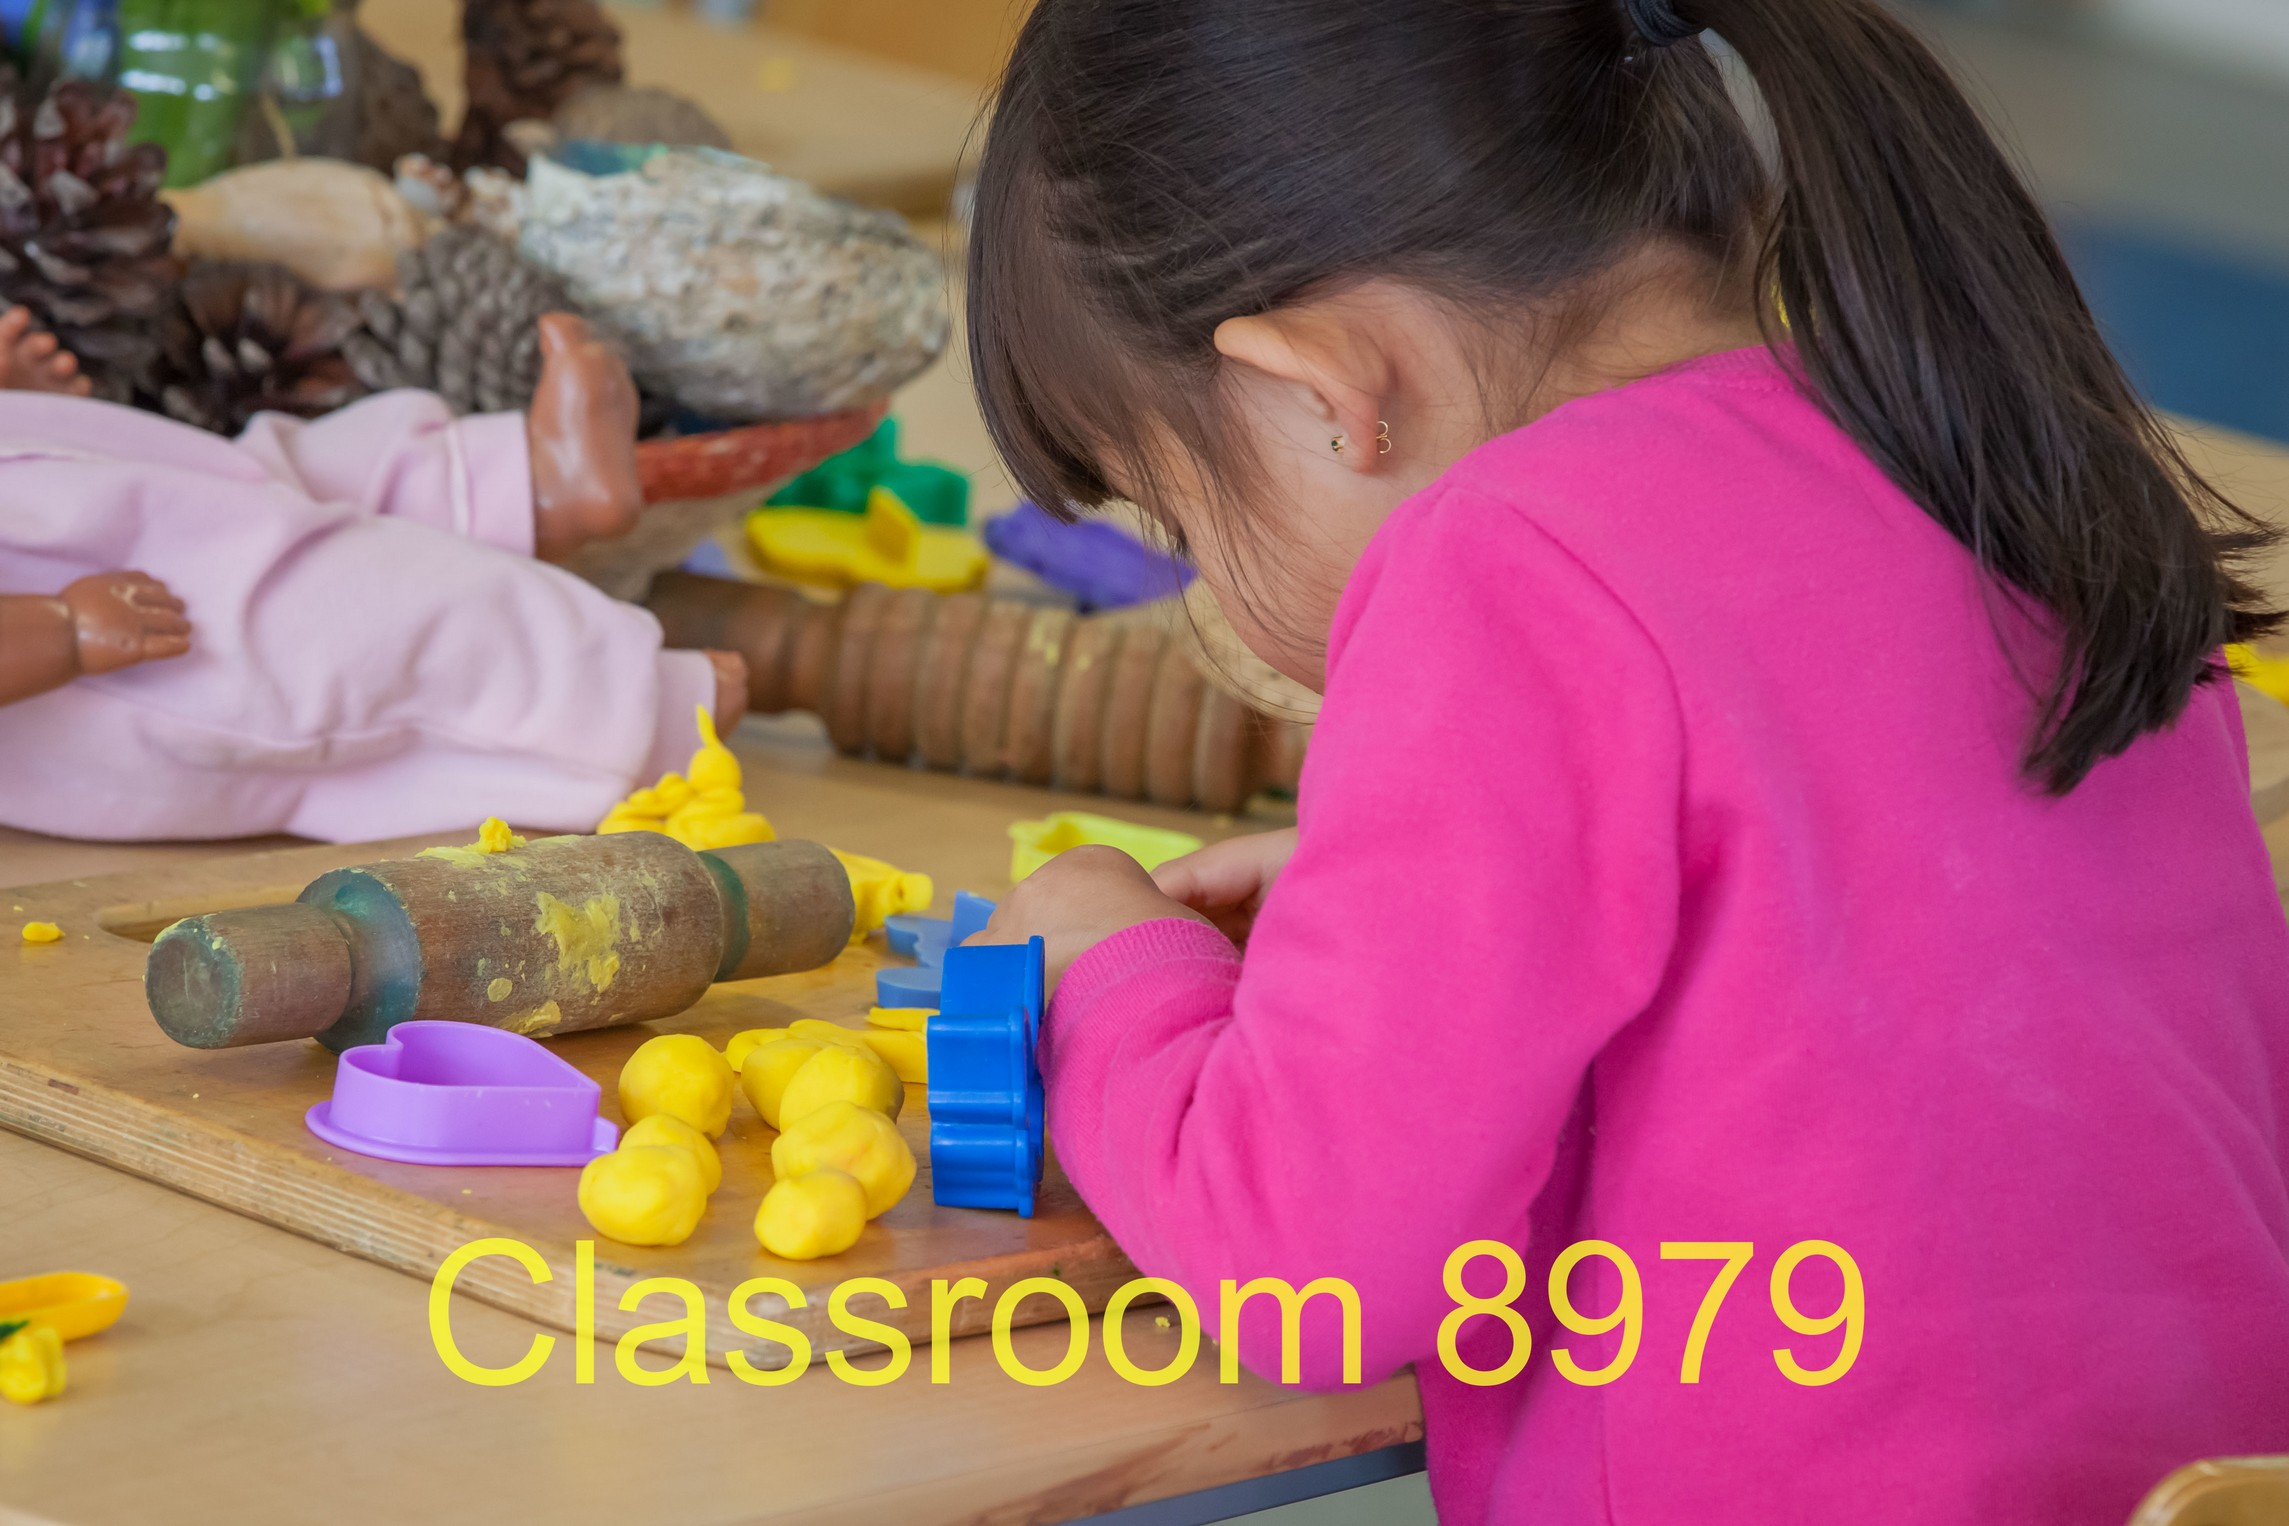 Classroom 8979